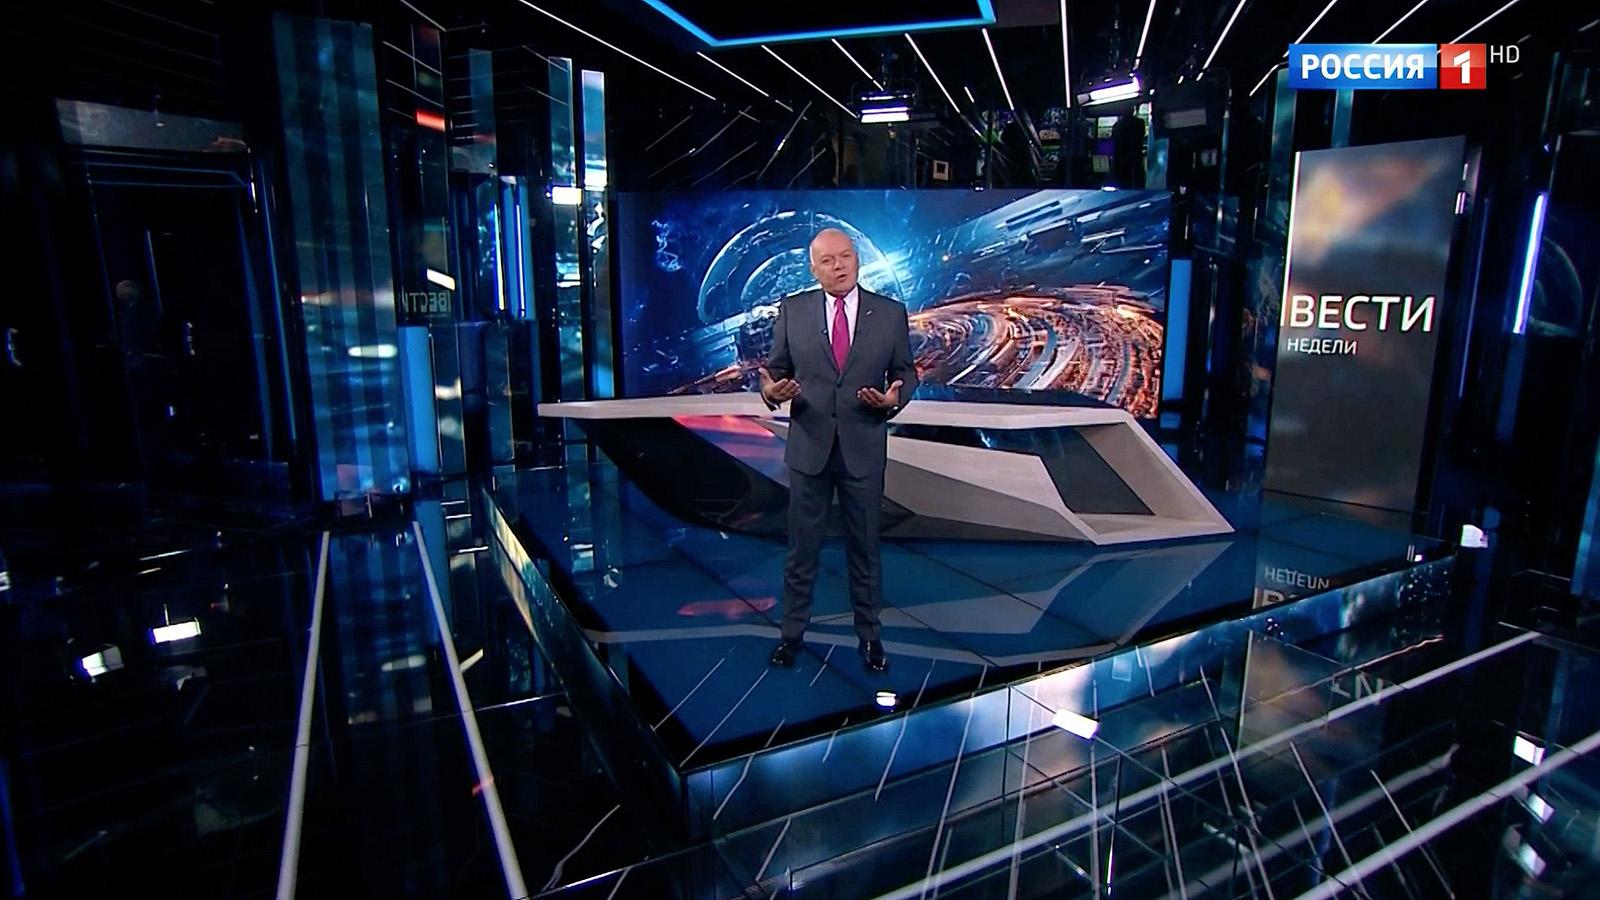 NCS_Russia-1-Vesti-Studio_0003